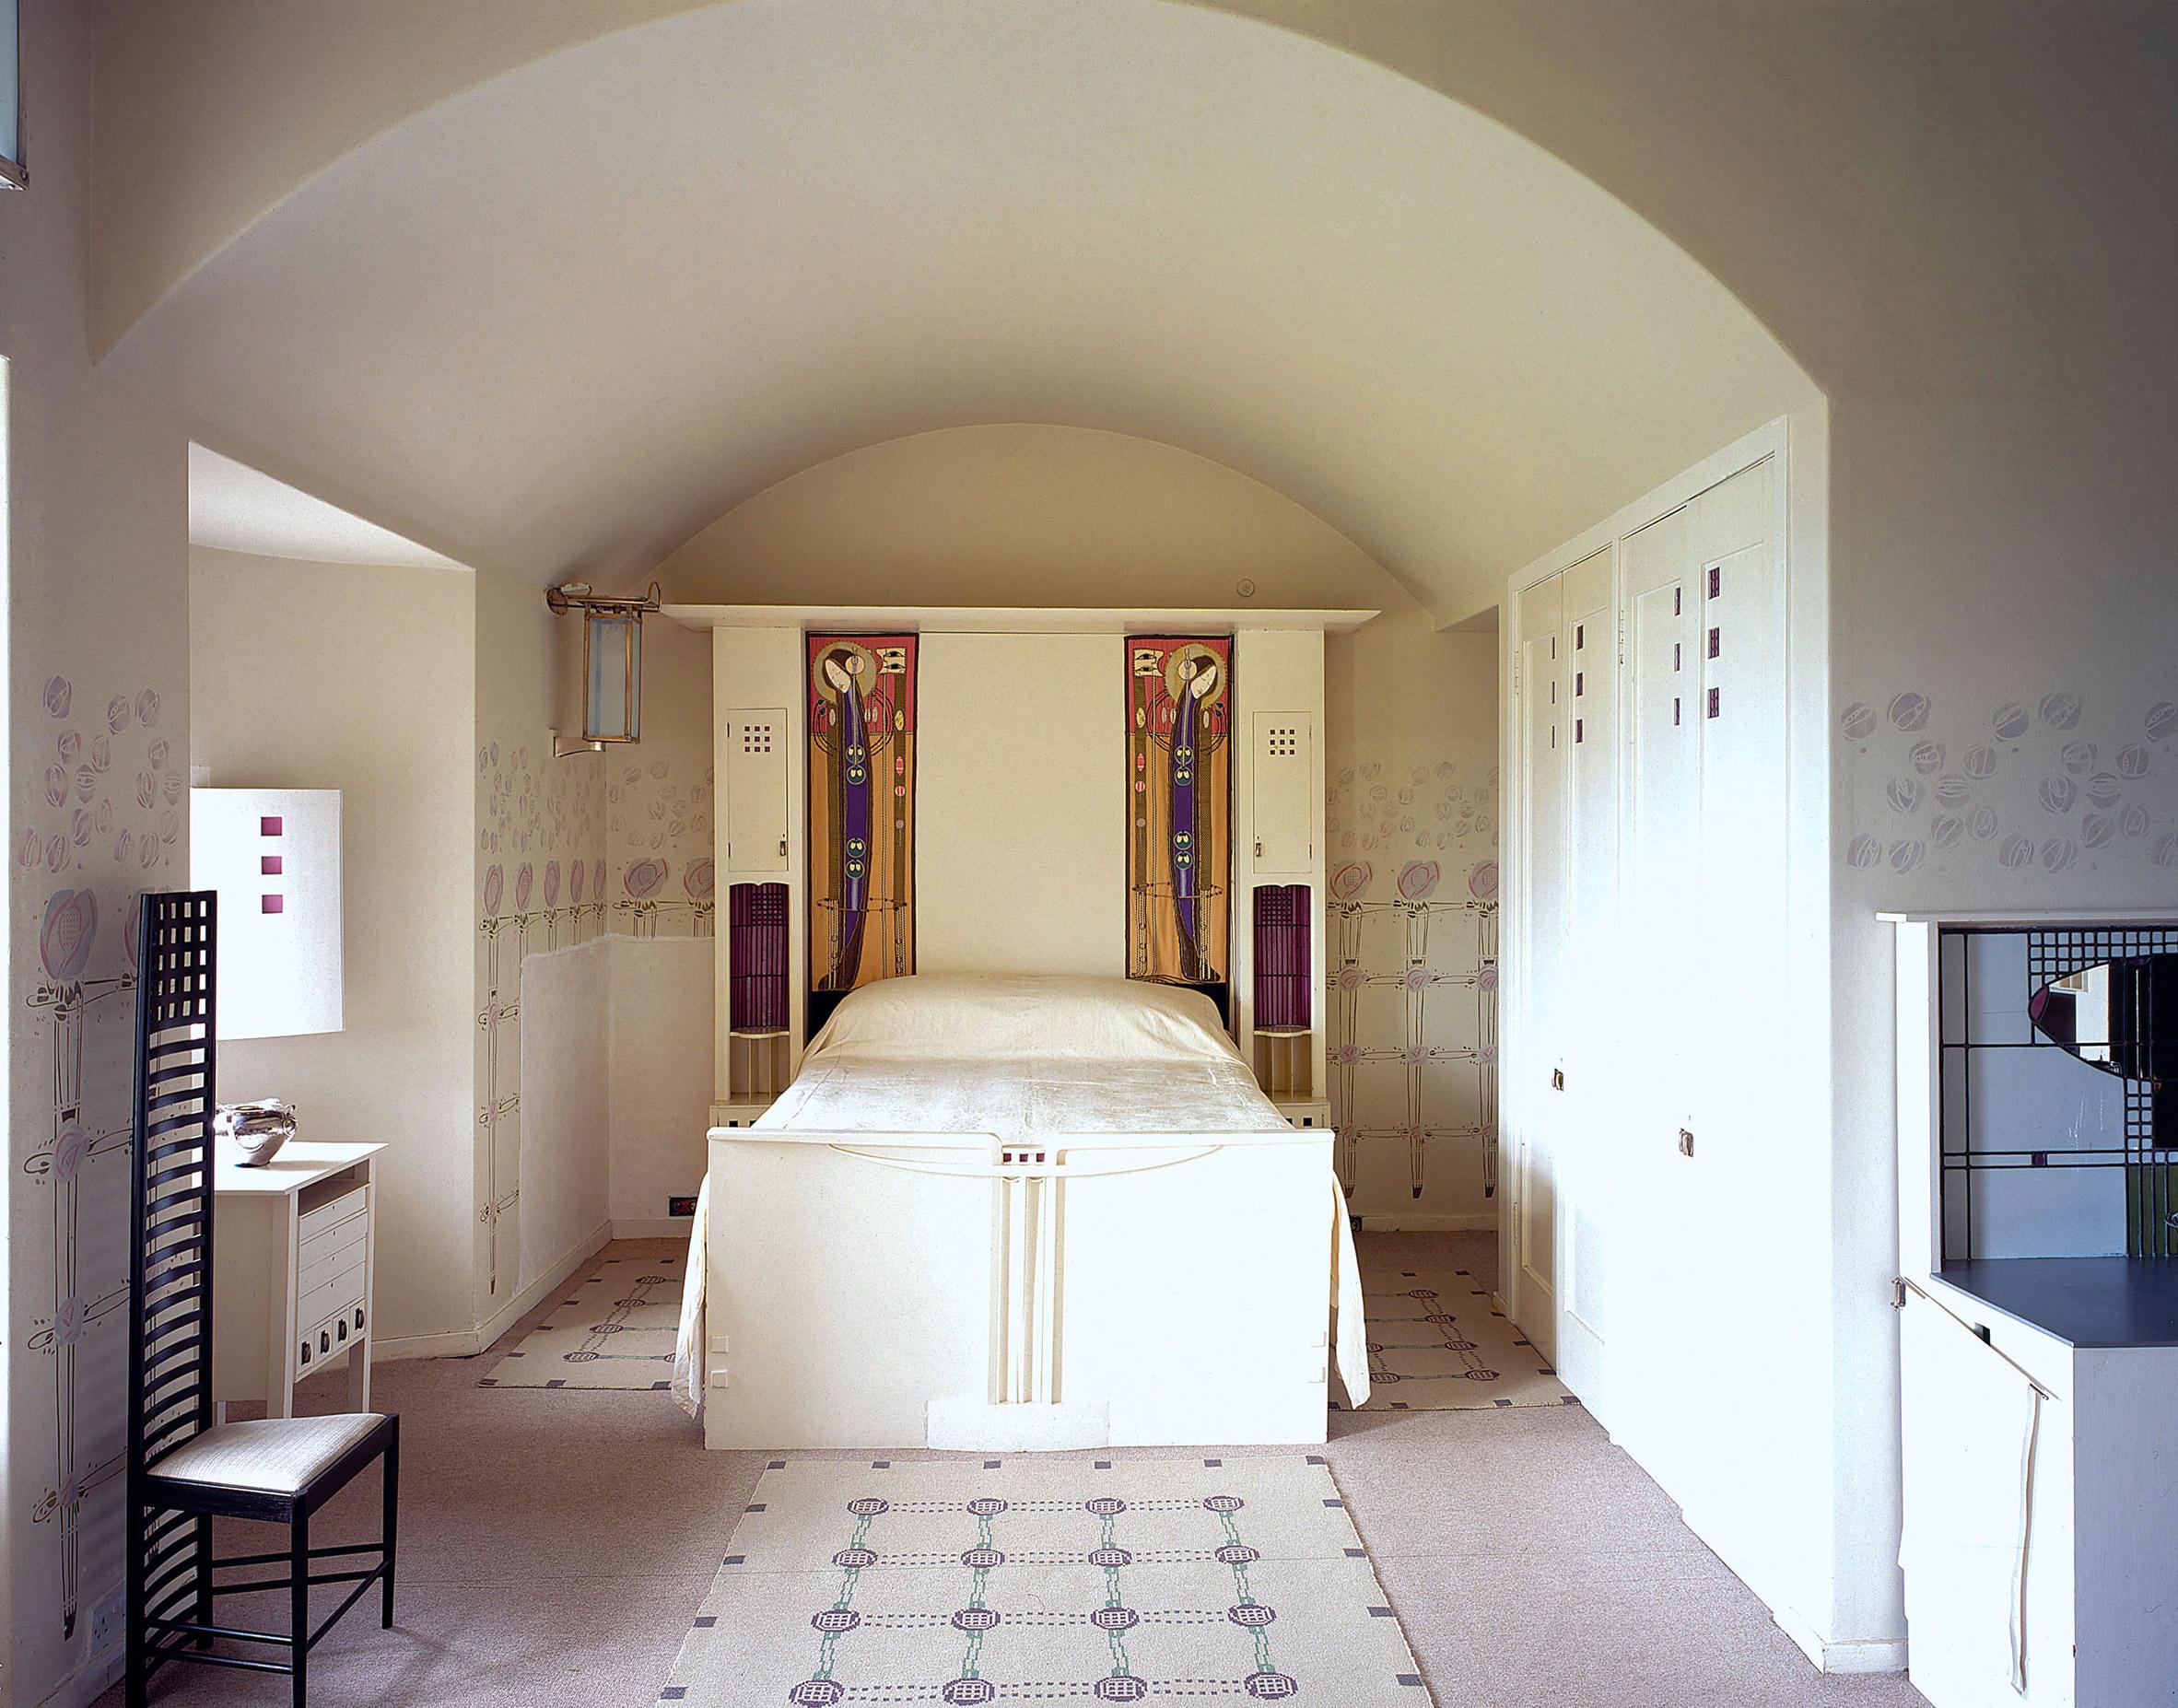 Hill House by Charles Rennie Mackintosh